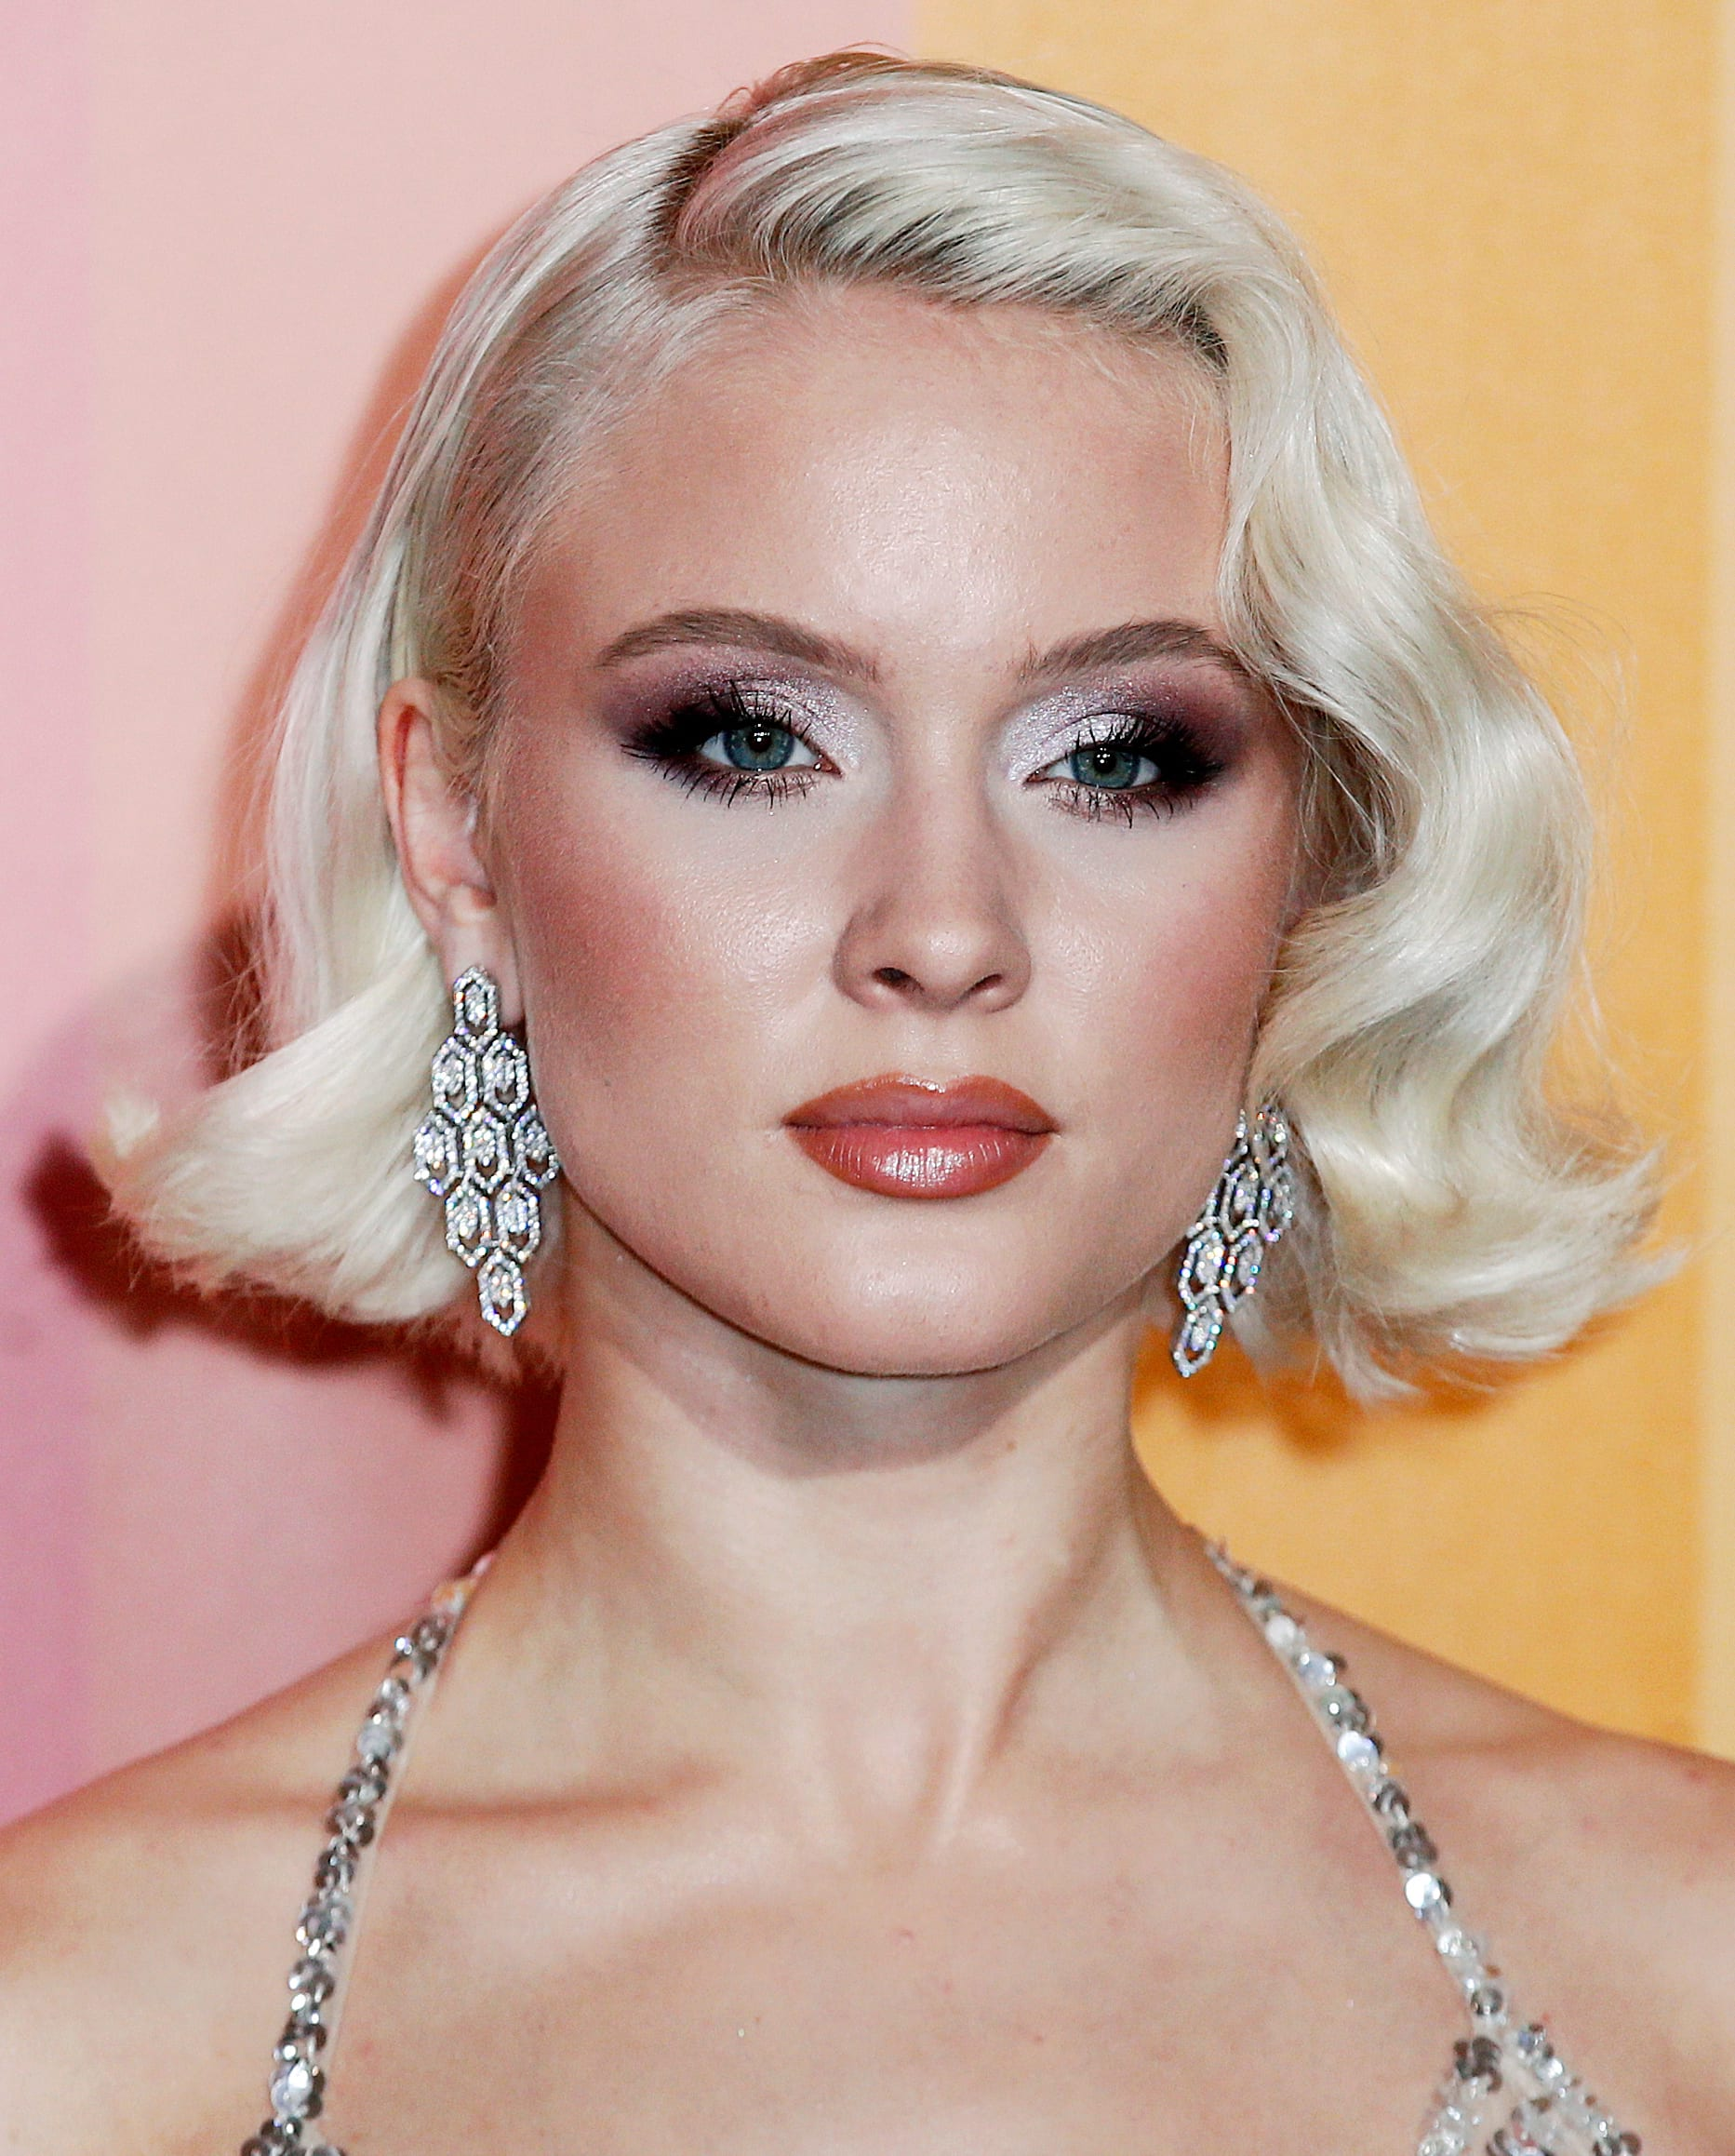 Zara Larson's Platinum Blonde Bob